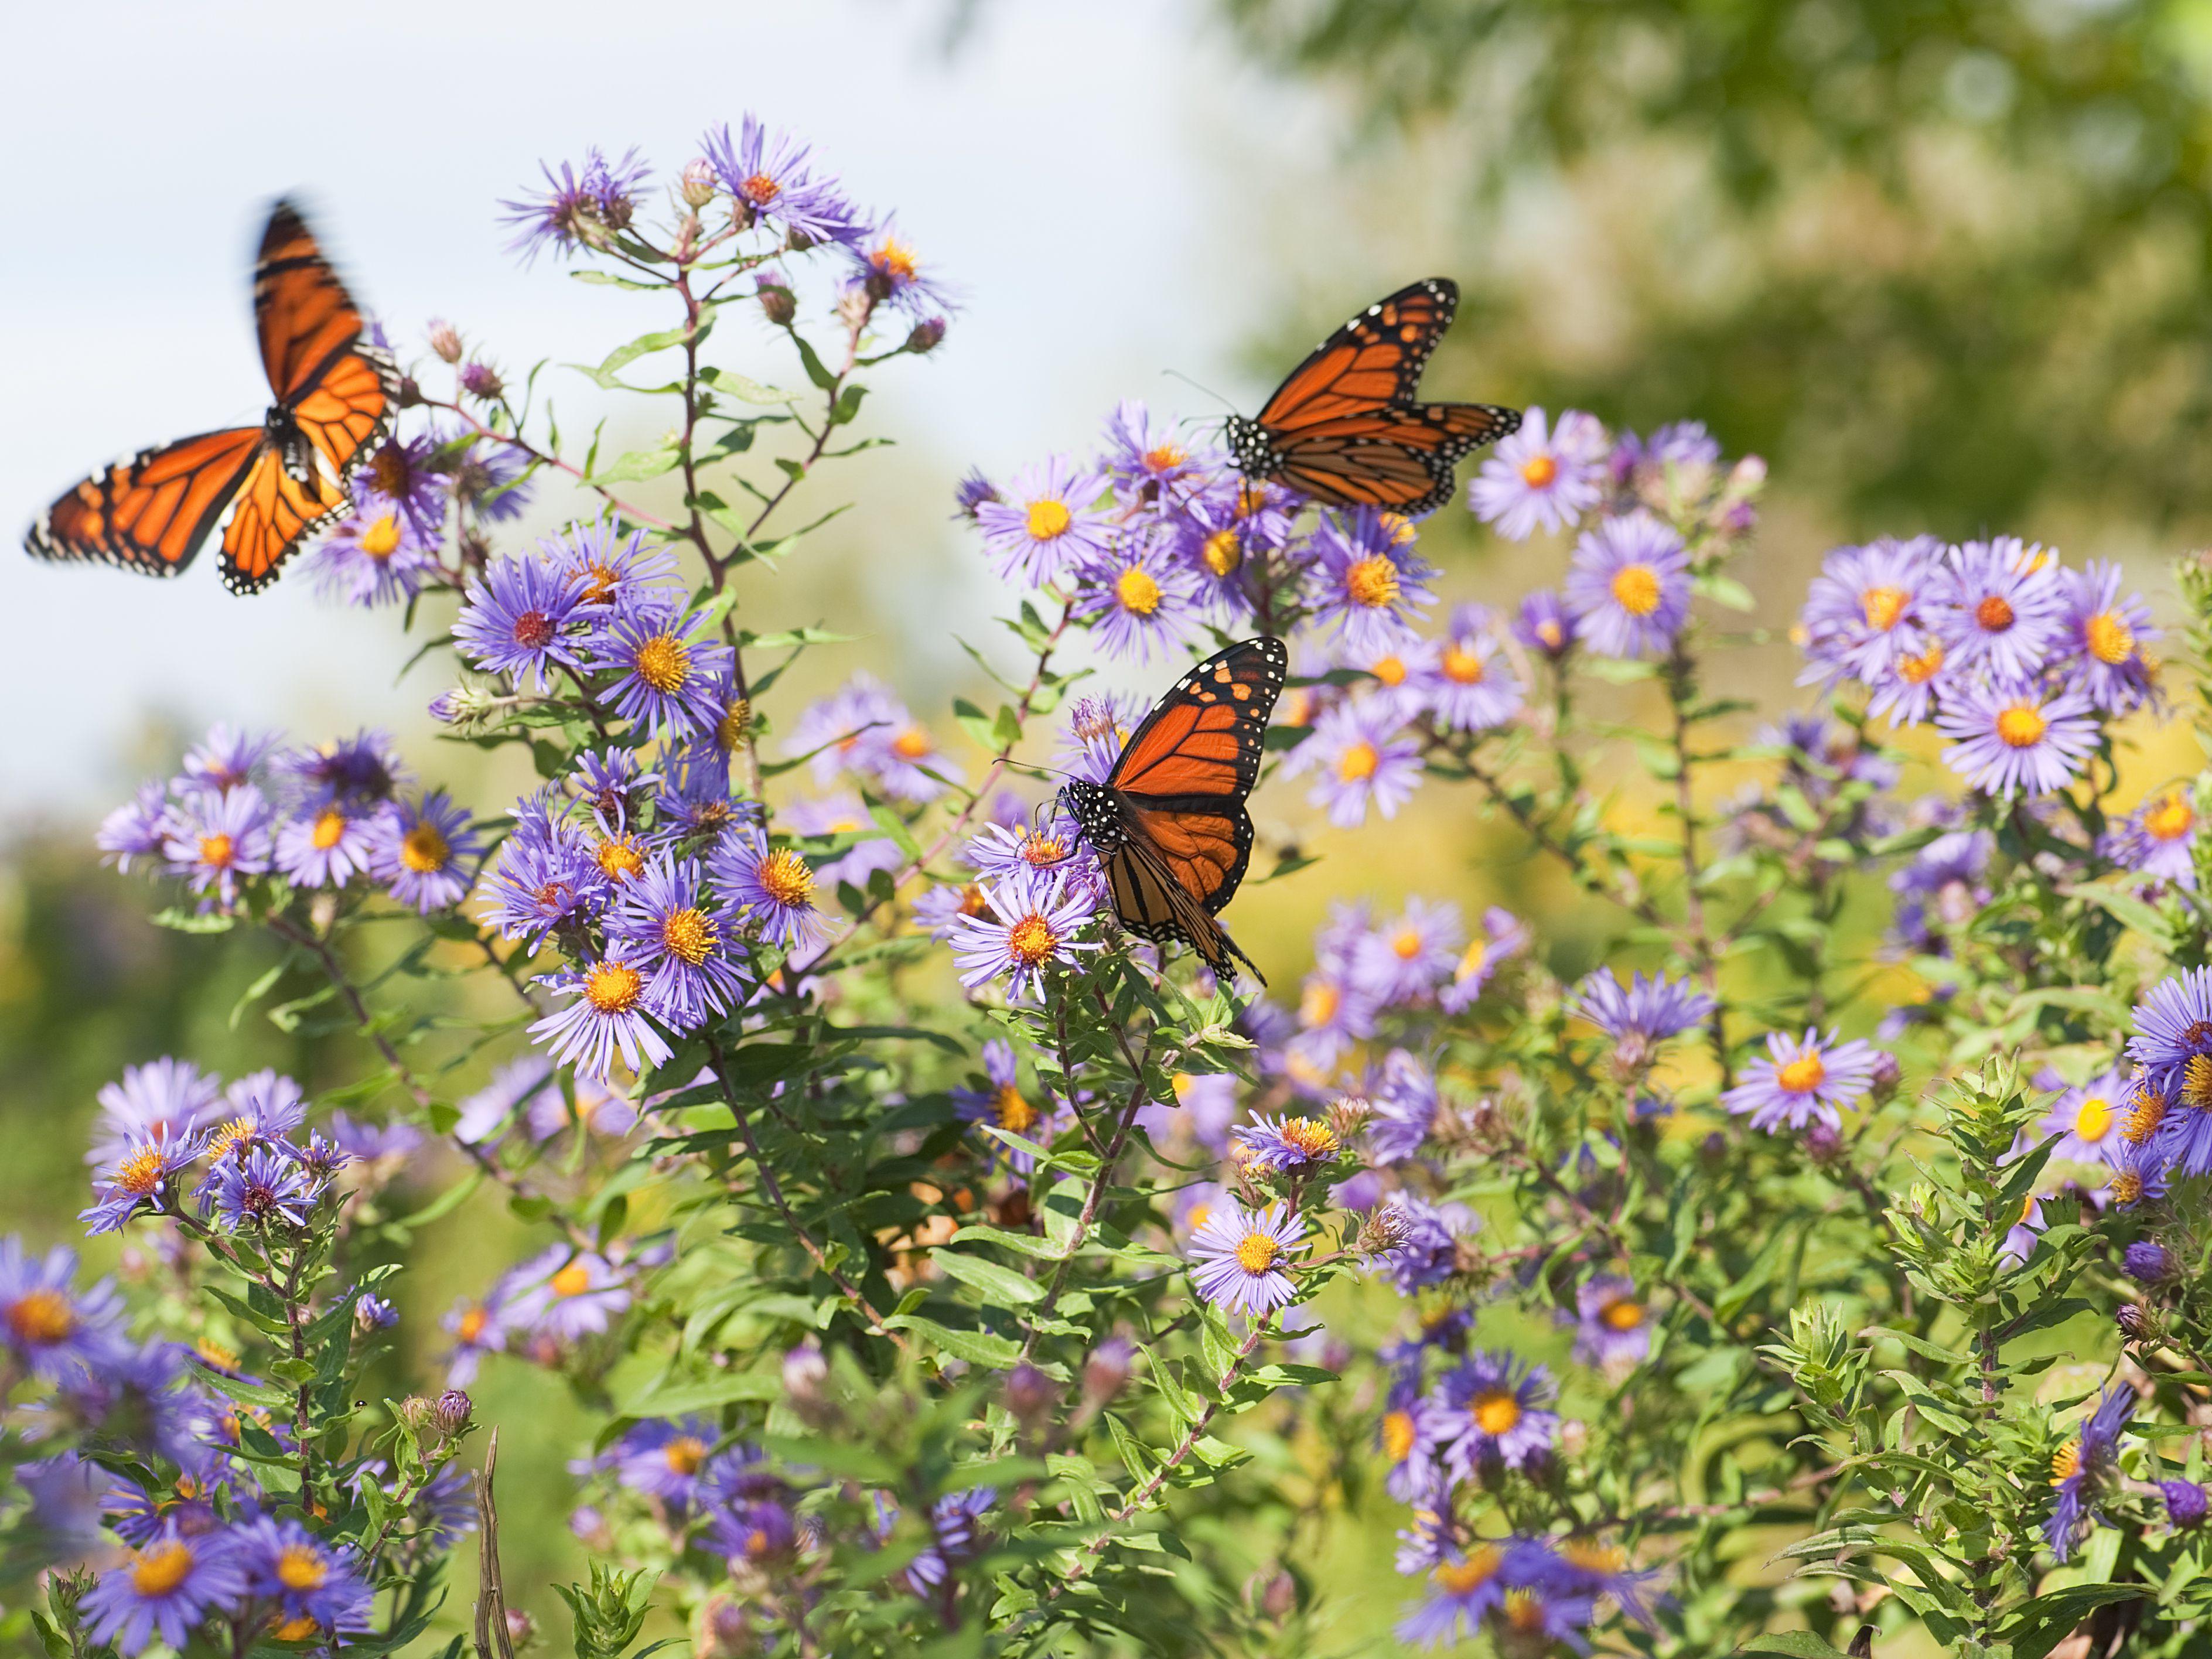 Beckoning Butterflies (via Zoom)